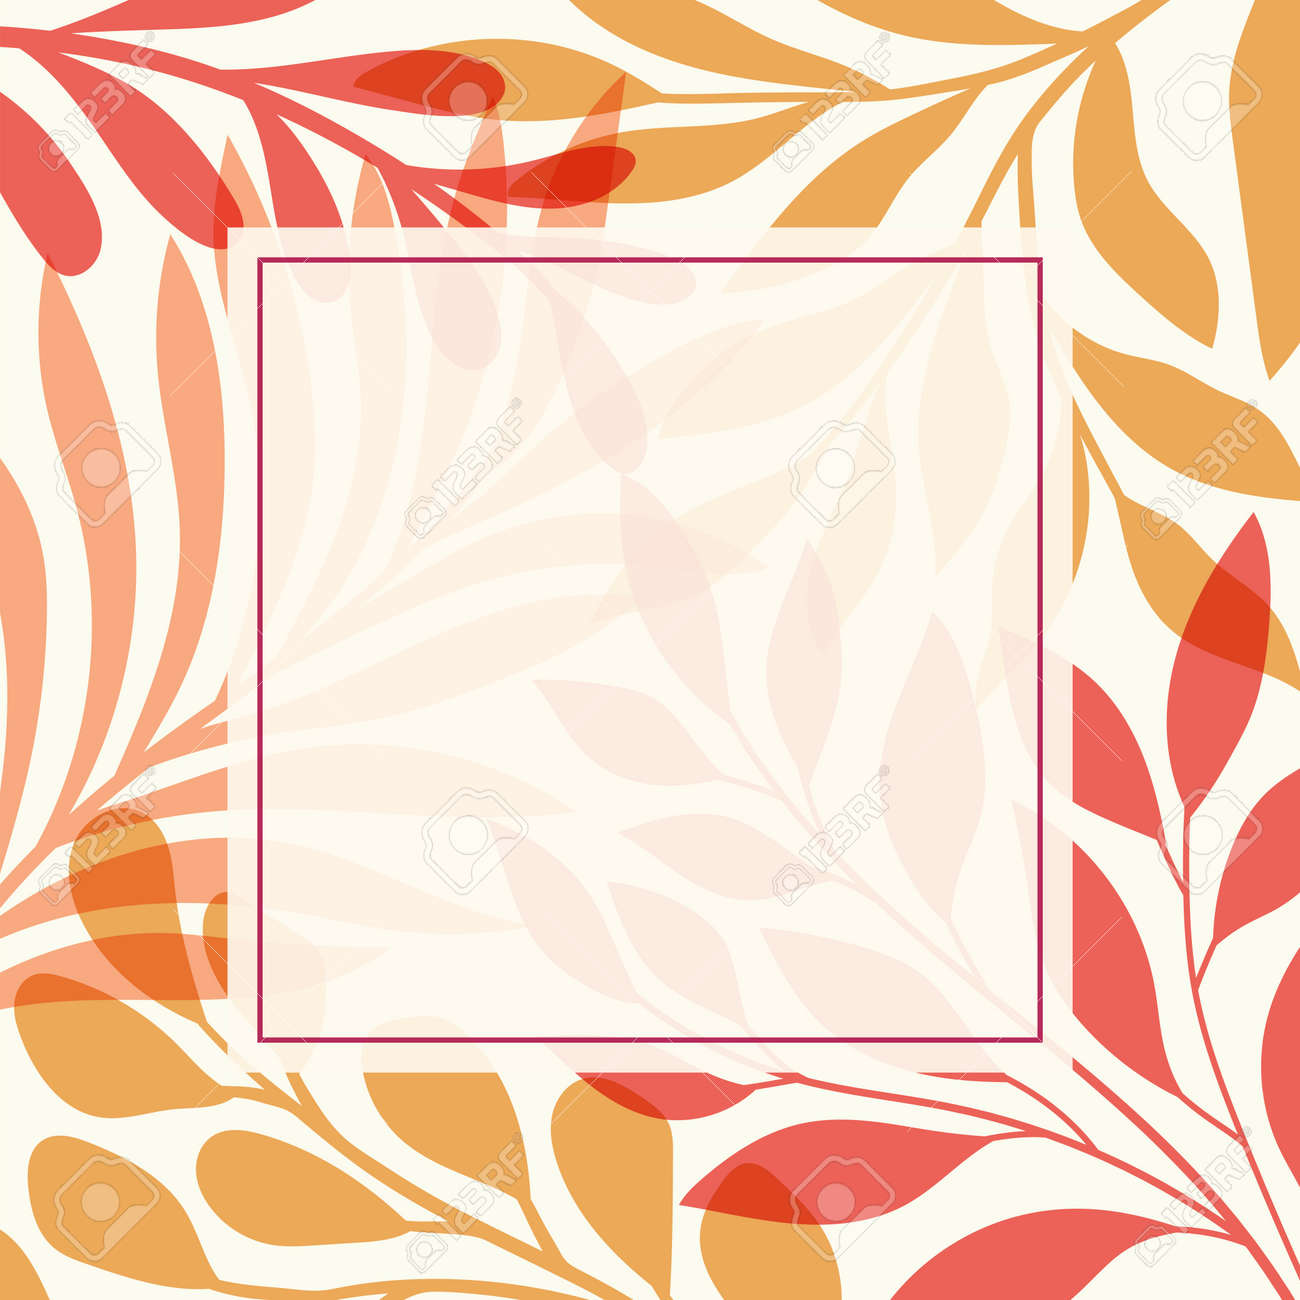 Modern floral vector banner. Botanical illustration template background. Abstract plant elements for print design, social media, post banner and presentation. - 168265311